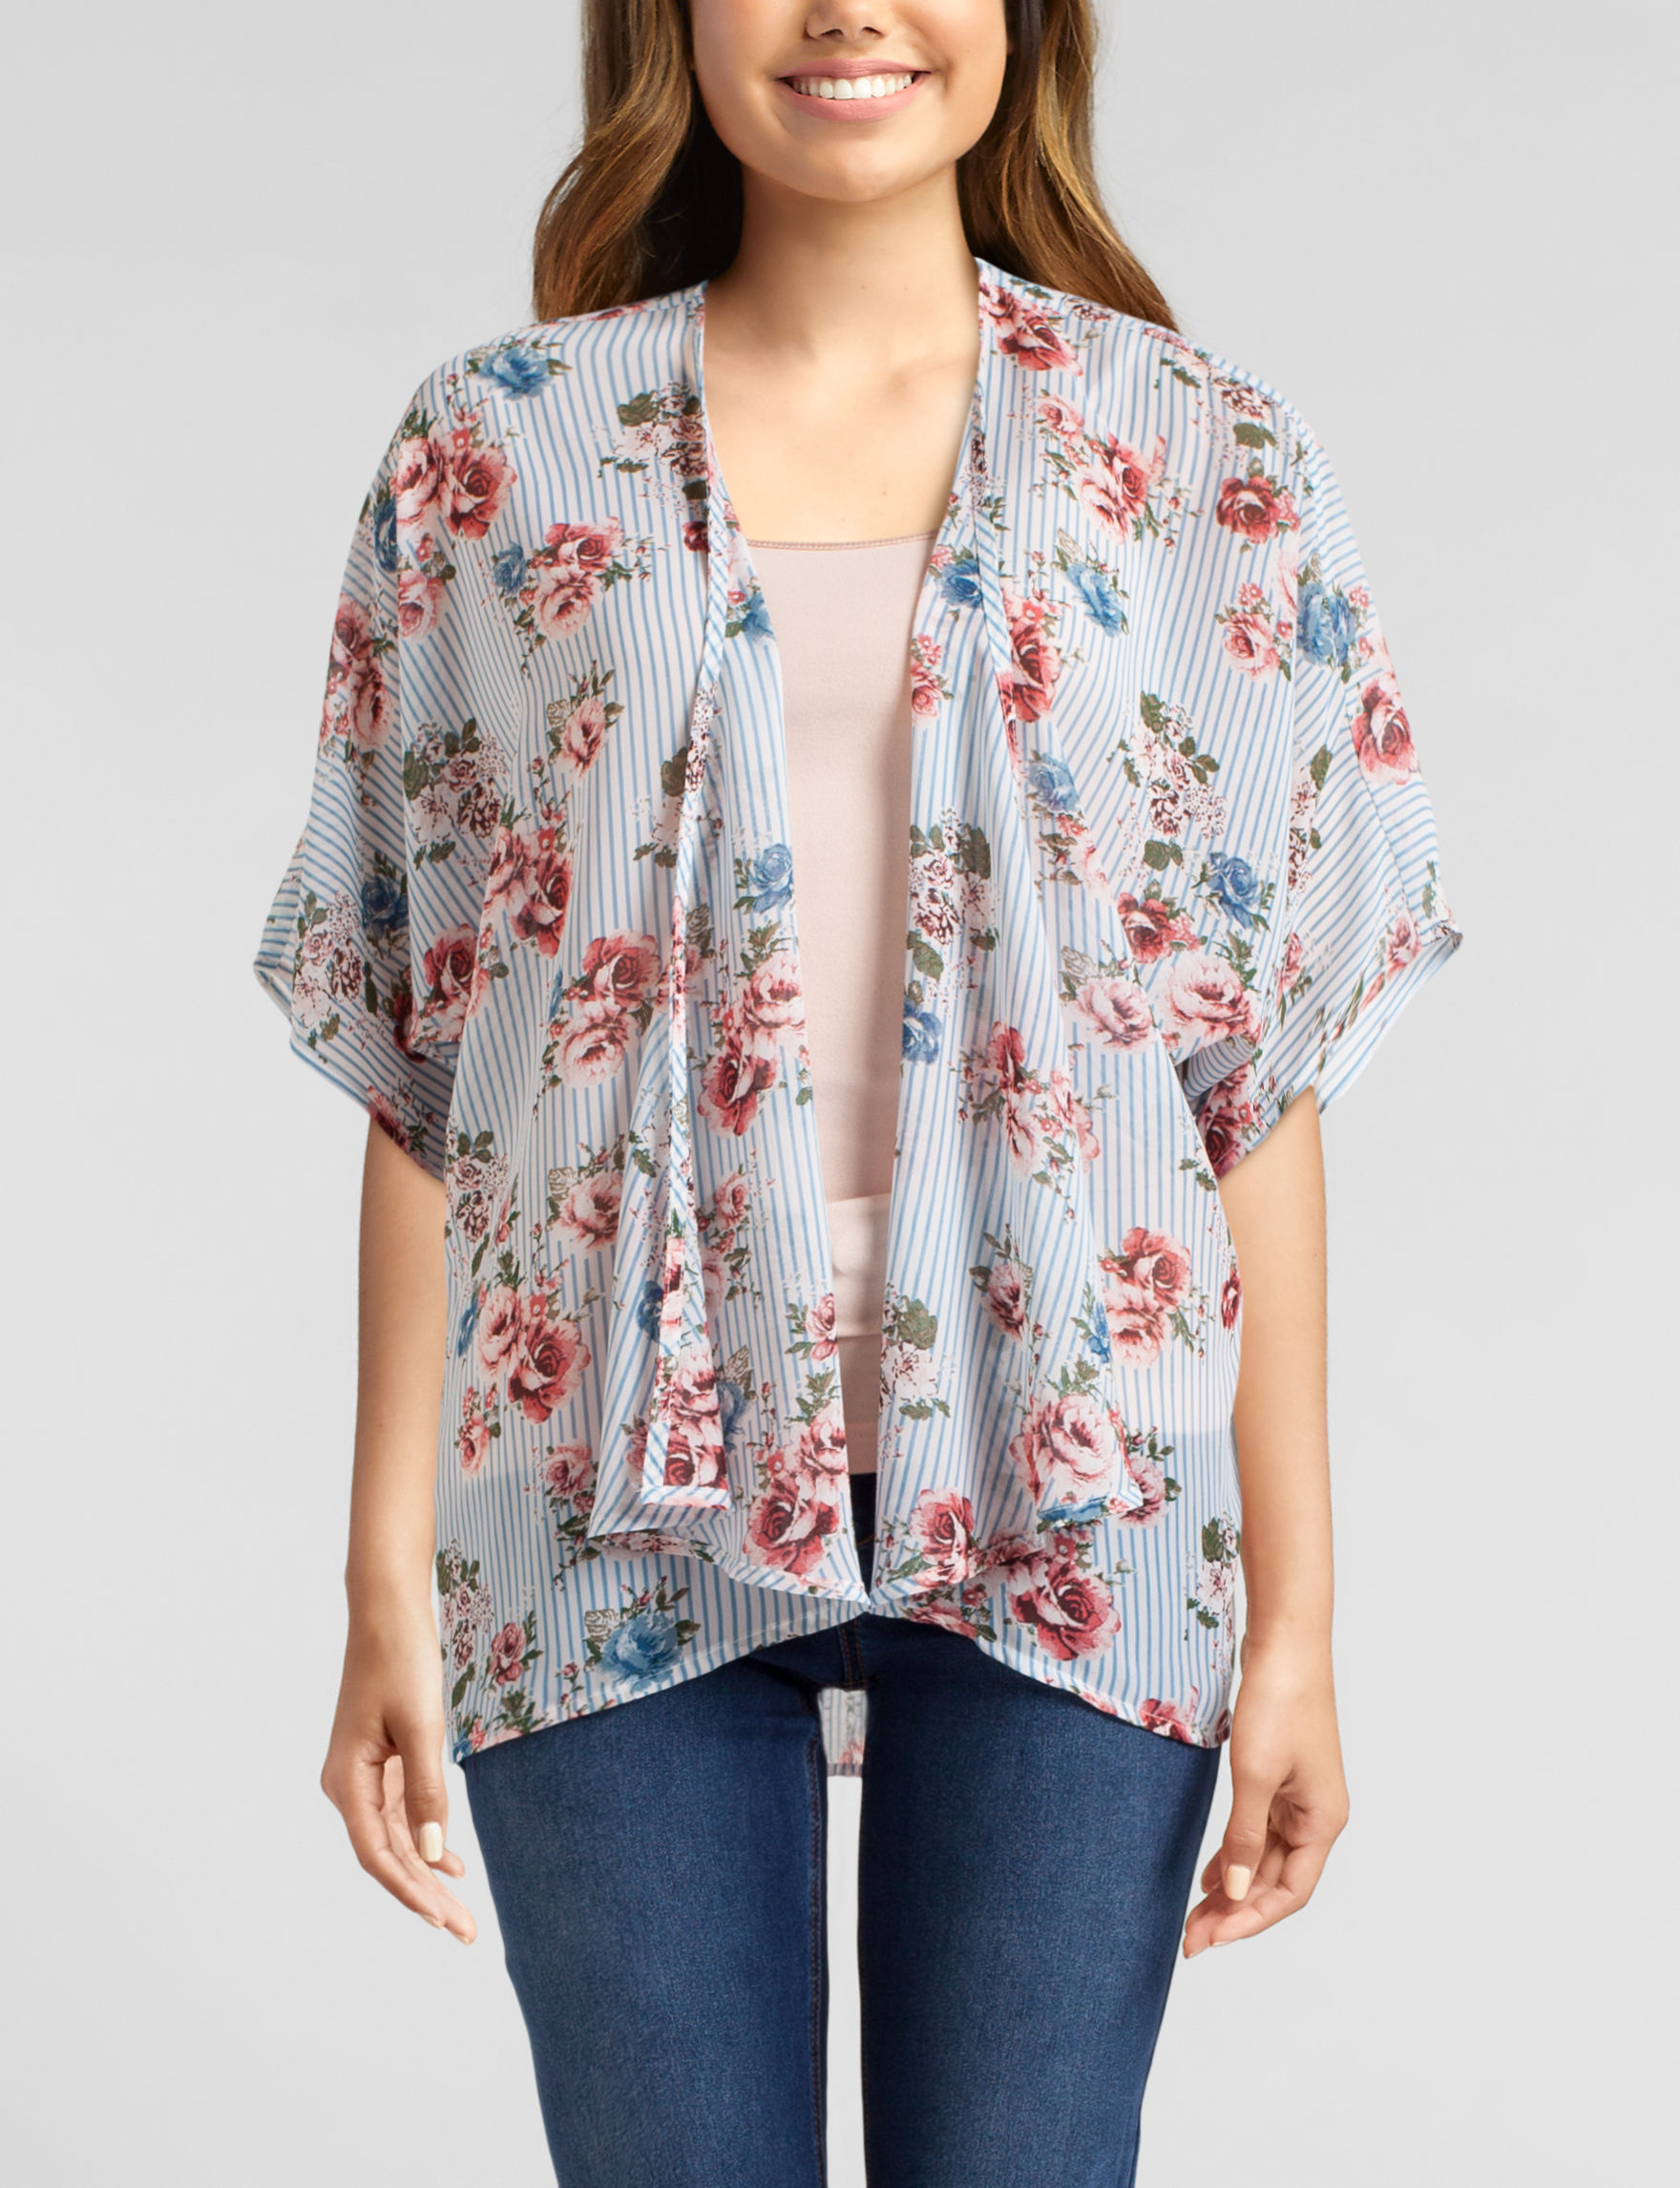 Wishful Park Blue Stripe Kimonos & Toppers